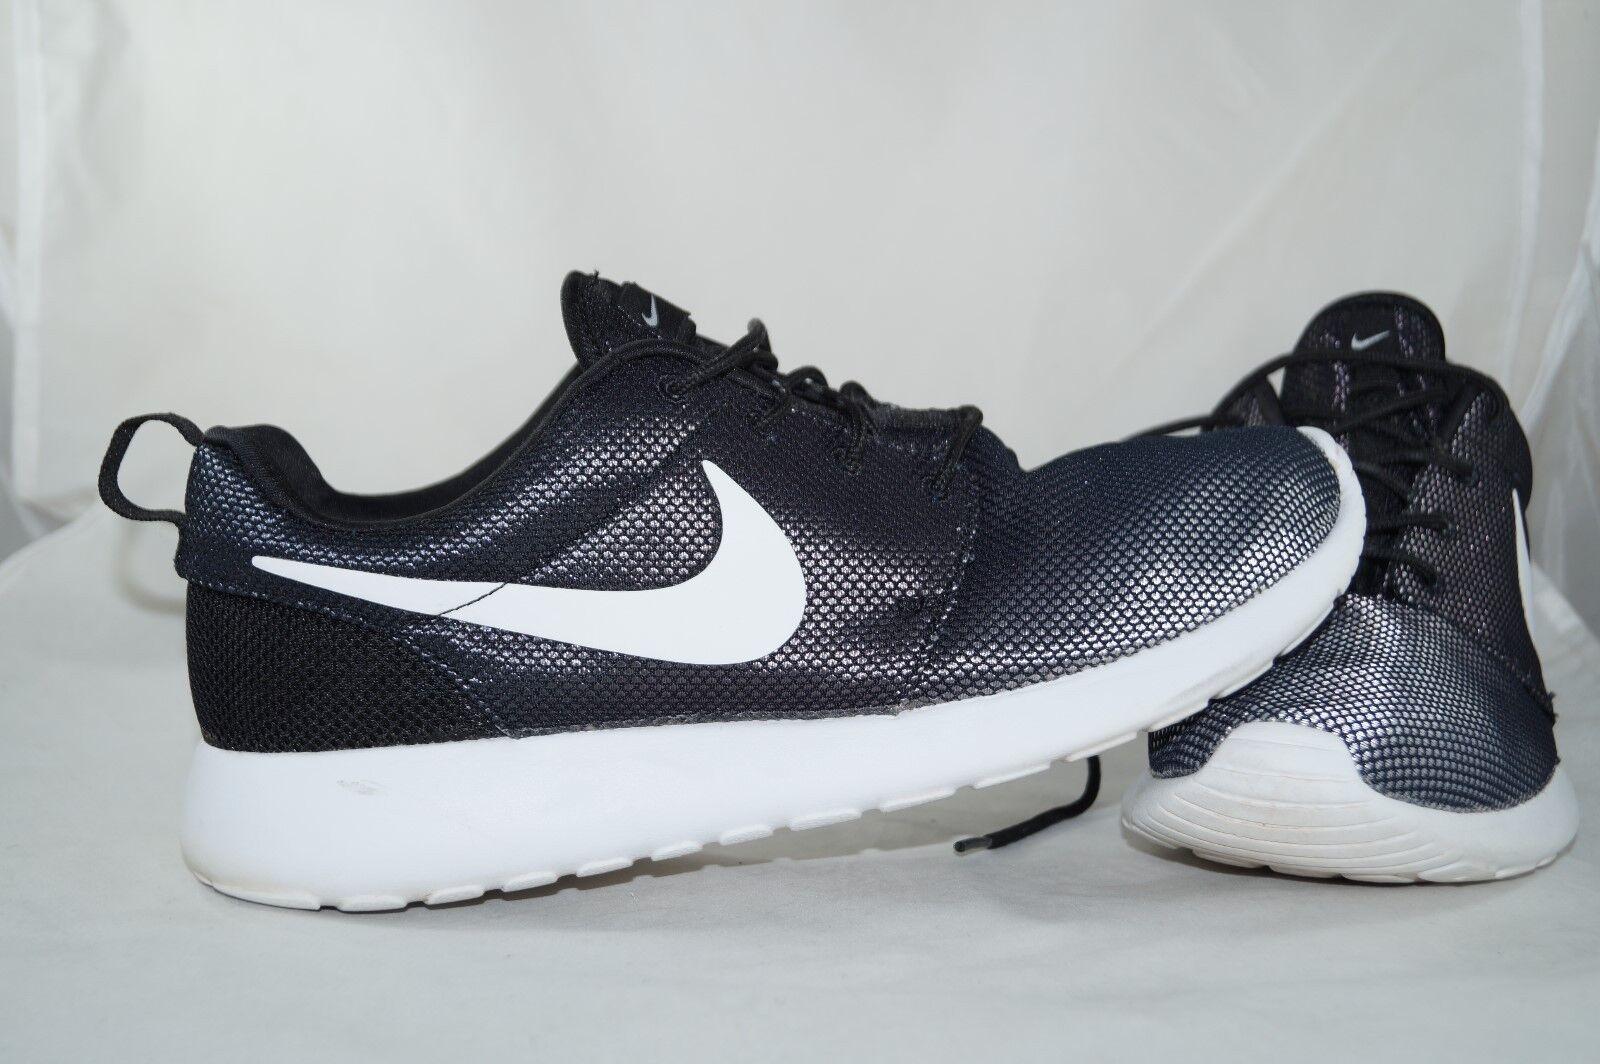 Nike Roshe Run Schwarz GR: 42  Jogging Running